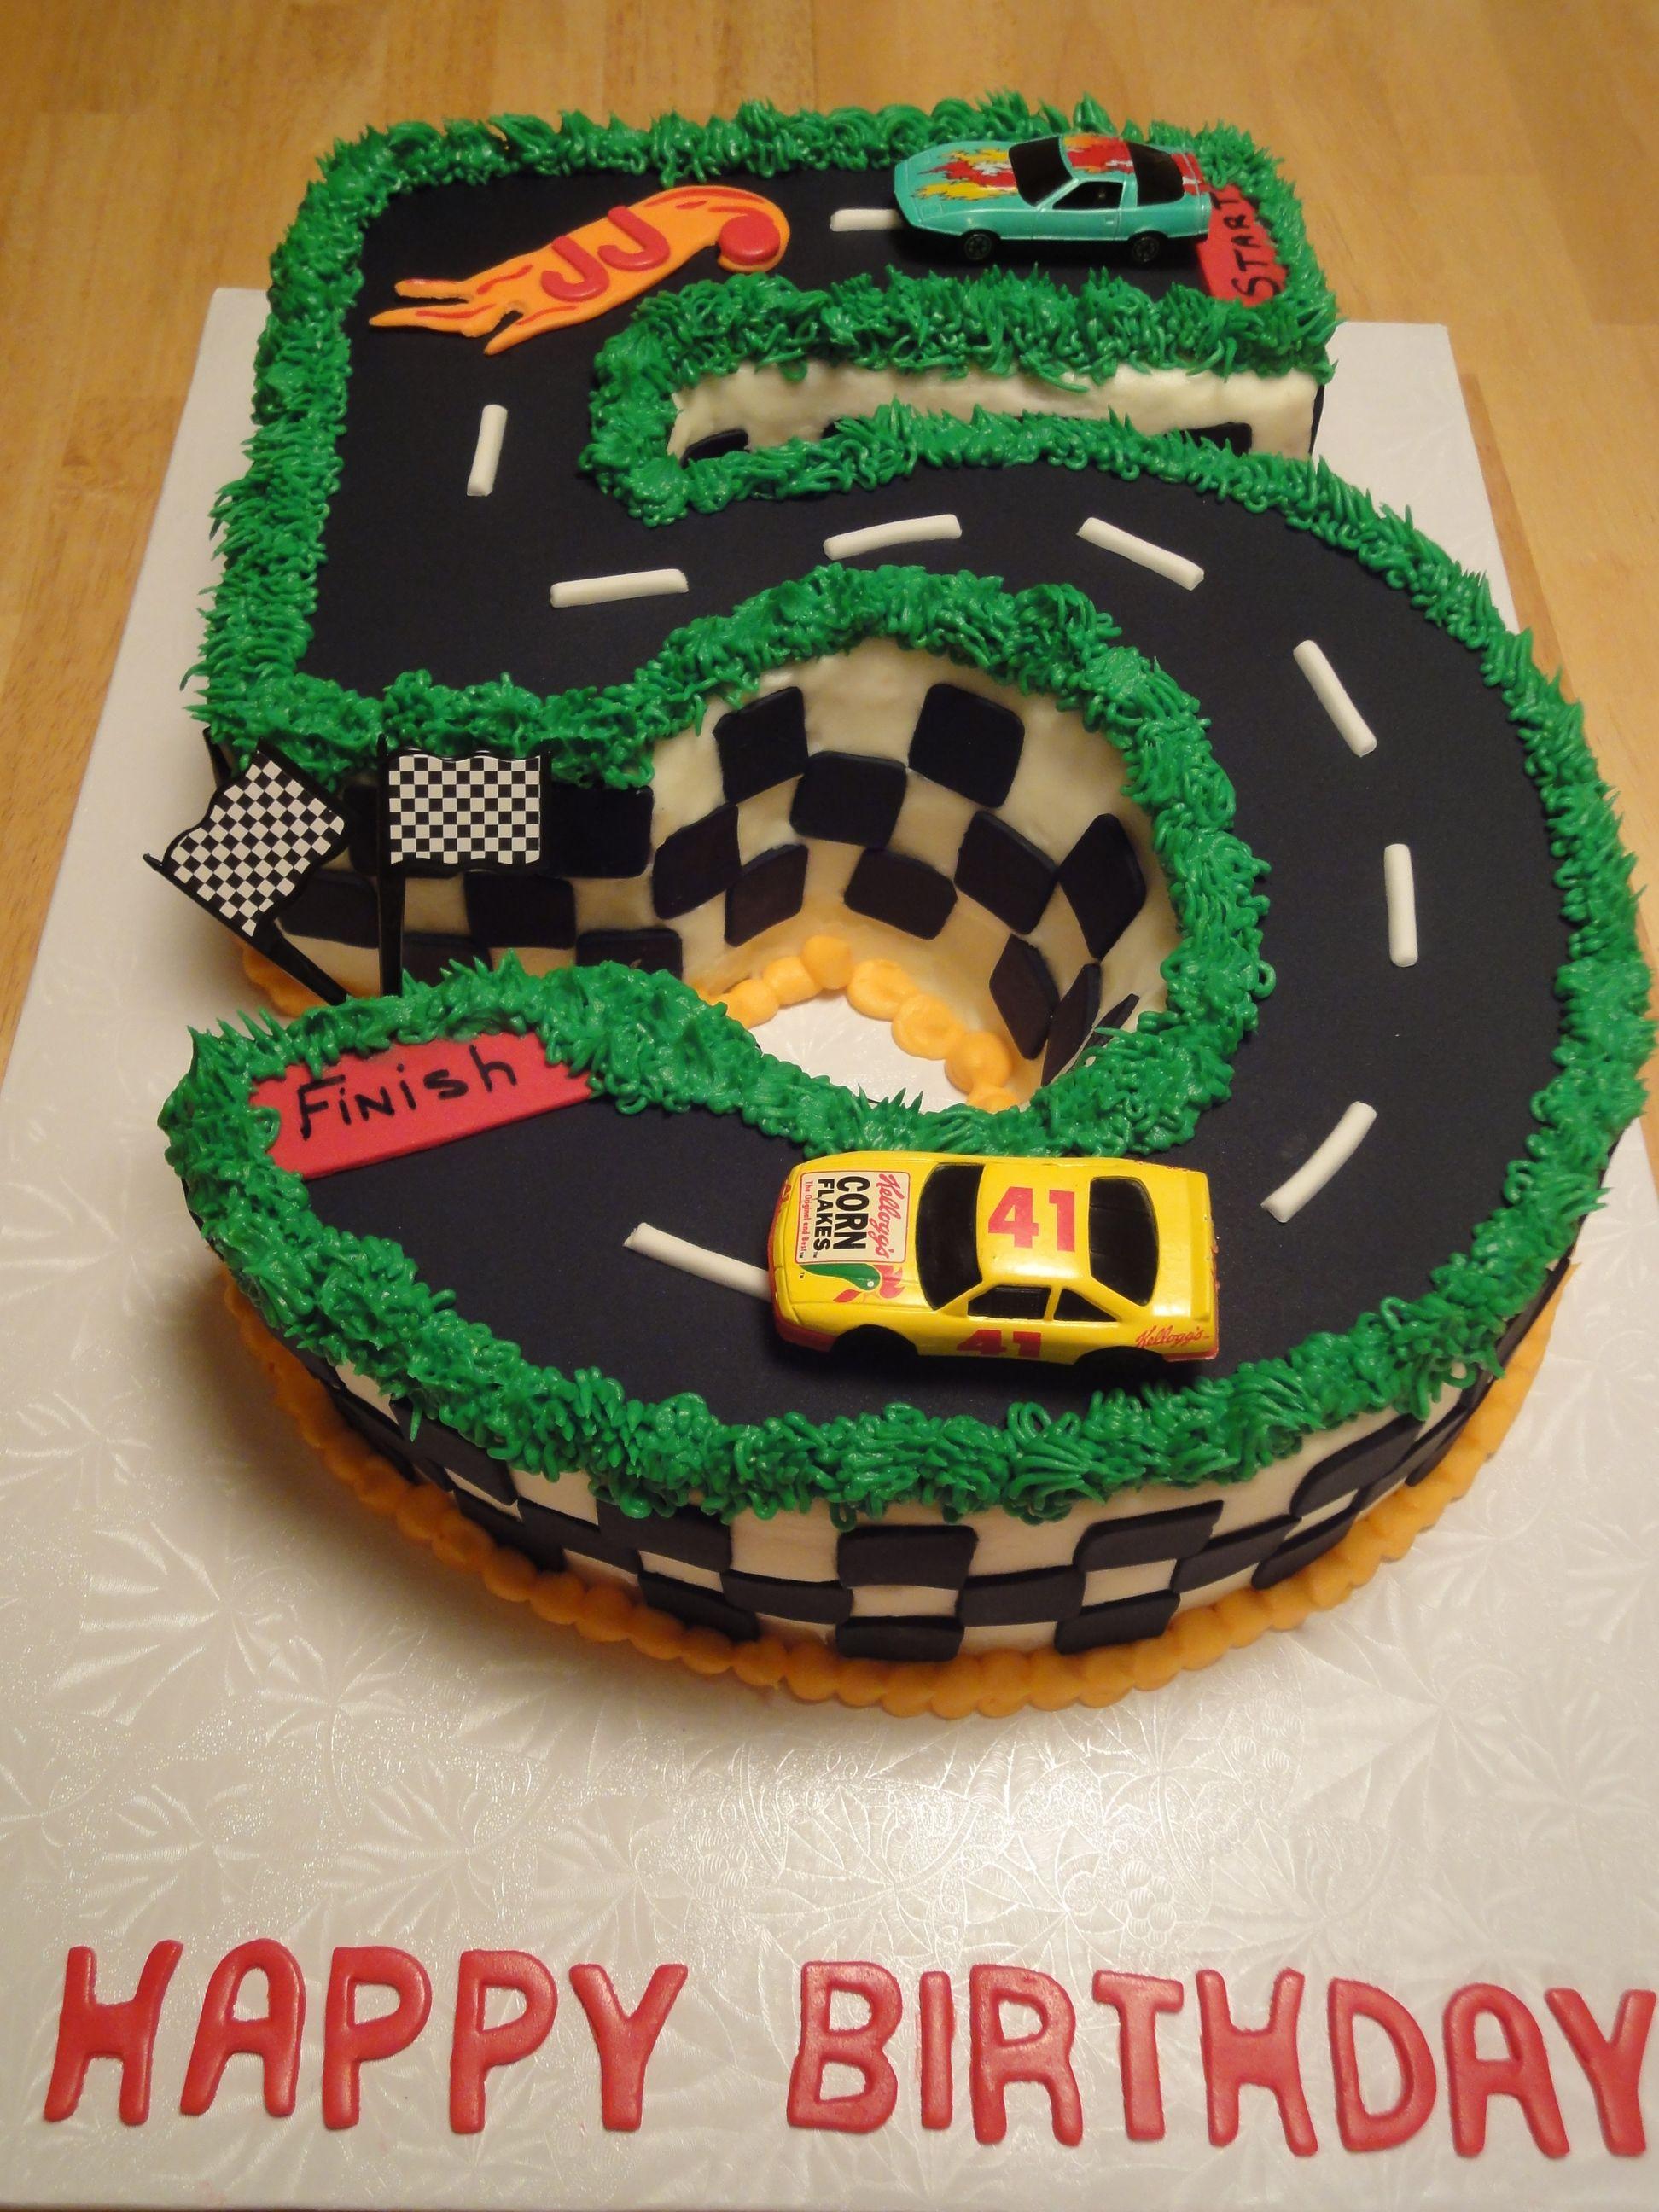 Happy Birthday To A 5 Year Old Boy Hot Wheels Cake Janies Sweet